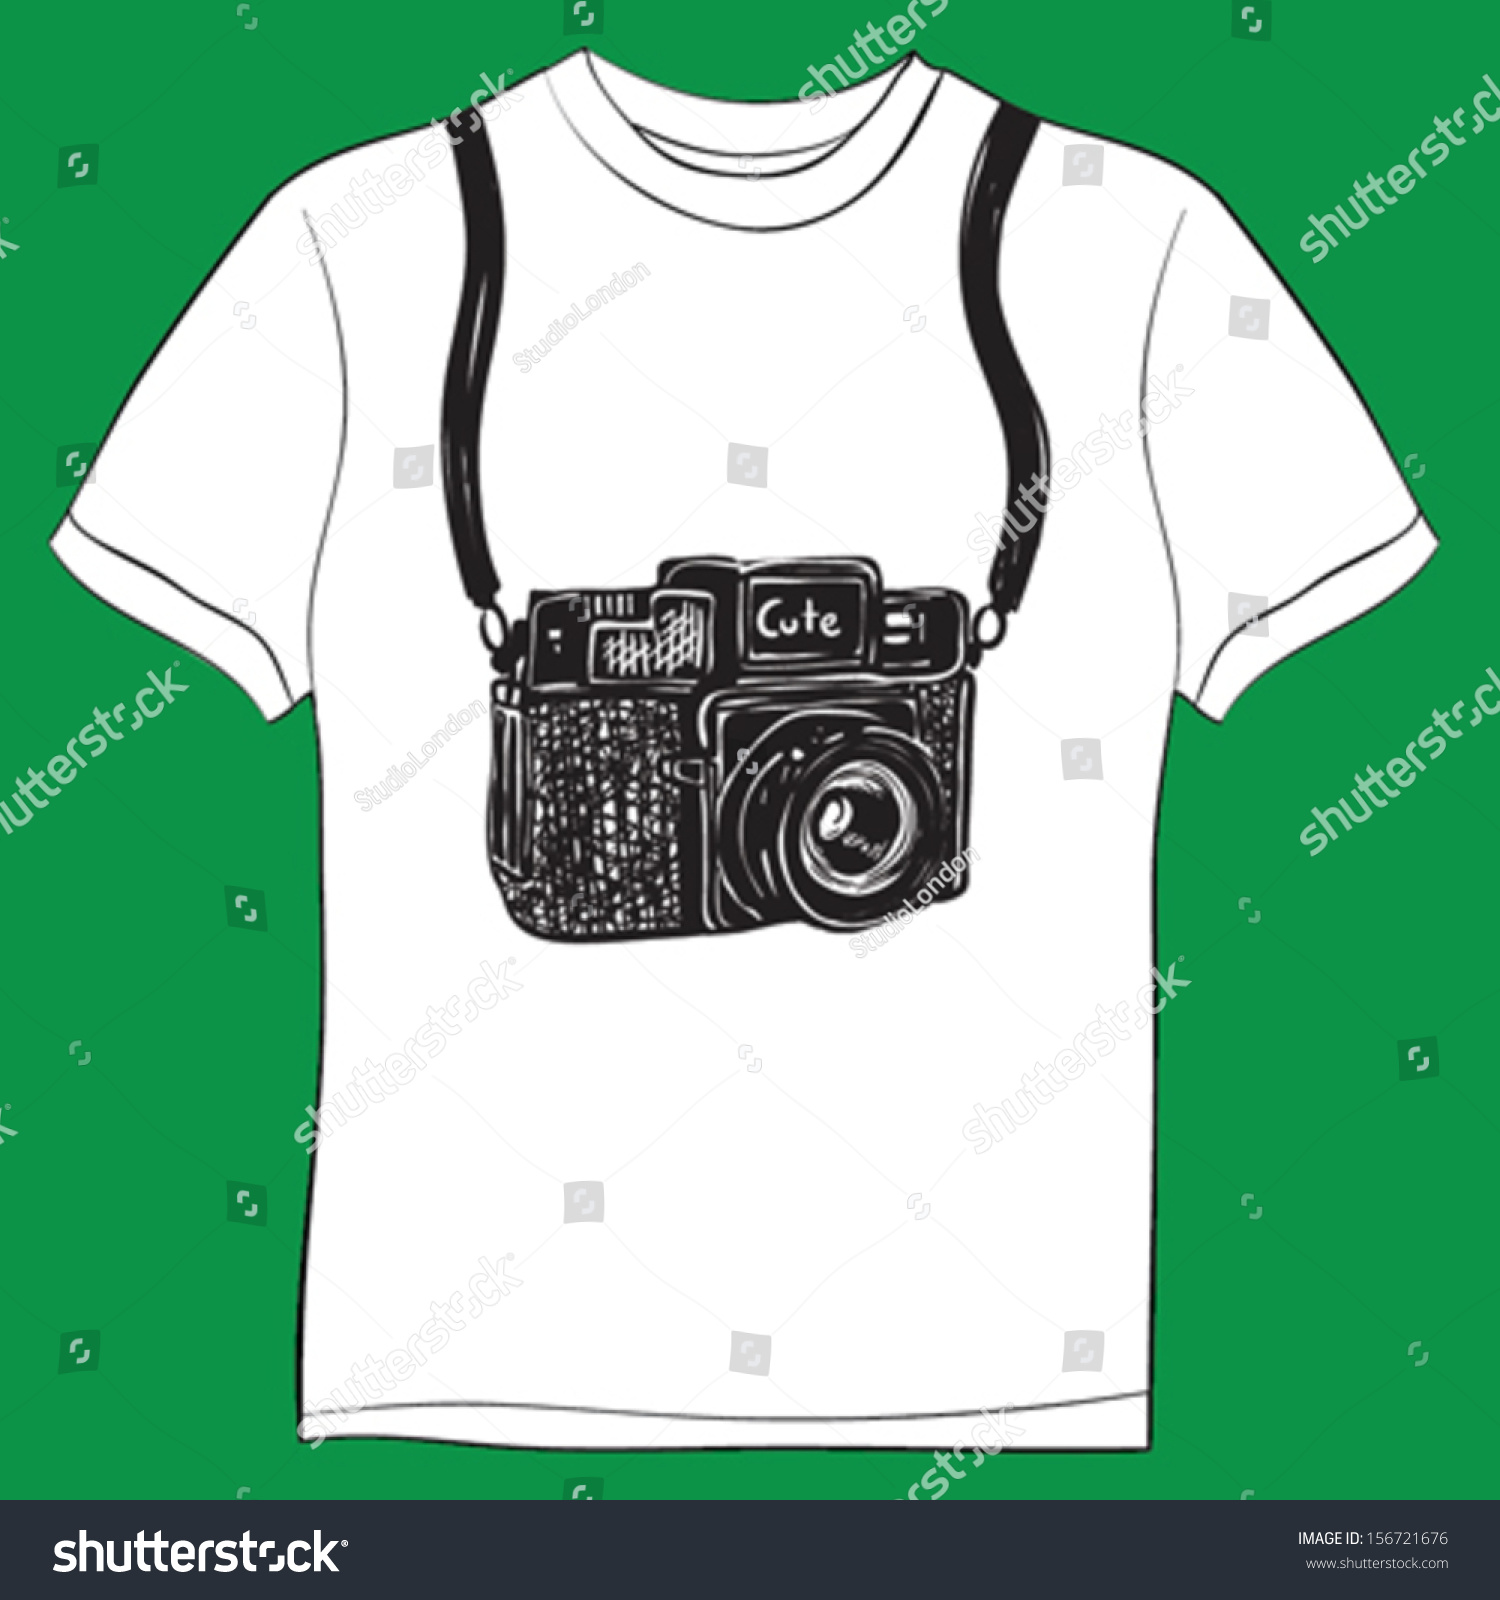 Cartoon Character T Shirt Design : Cameratshirt graphicscute cartoon characterscute graphics